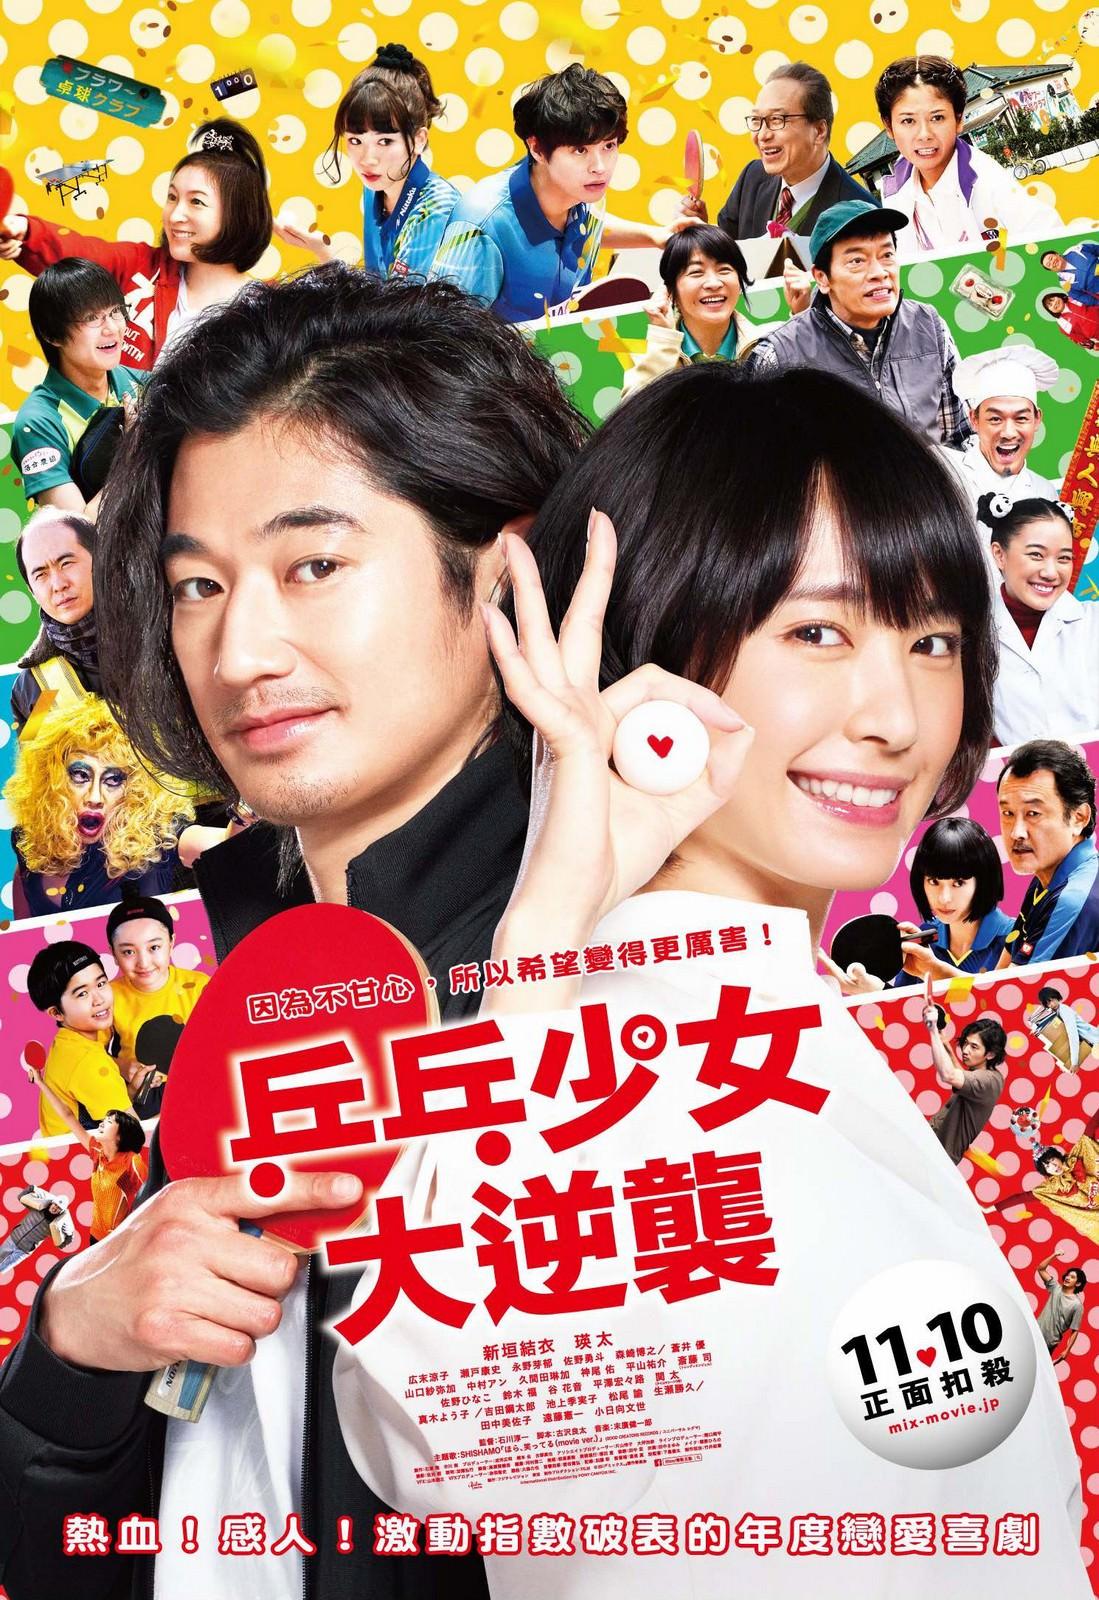 Movie, ミックス。(日本, 2017年) / 乒乓少女大逆襲(台灣) / 乒乓情人夢(香港) / Mix(英文) / 混合双打(網路), 電影海報, 台灣